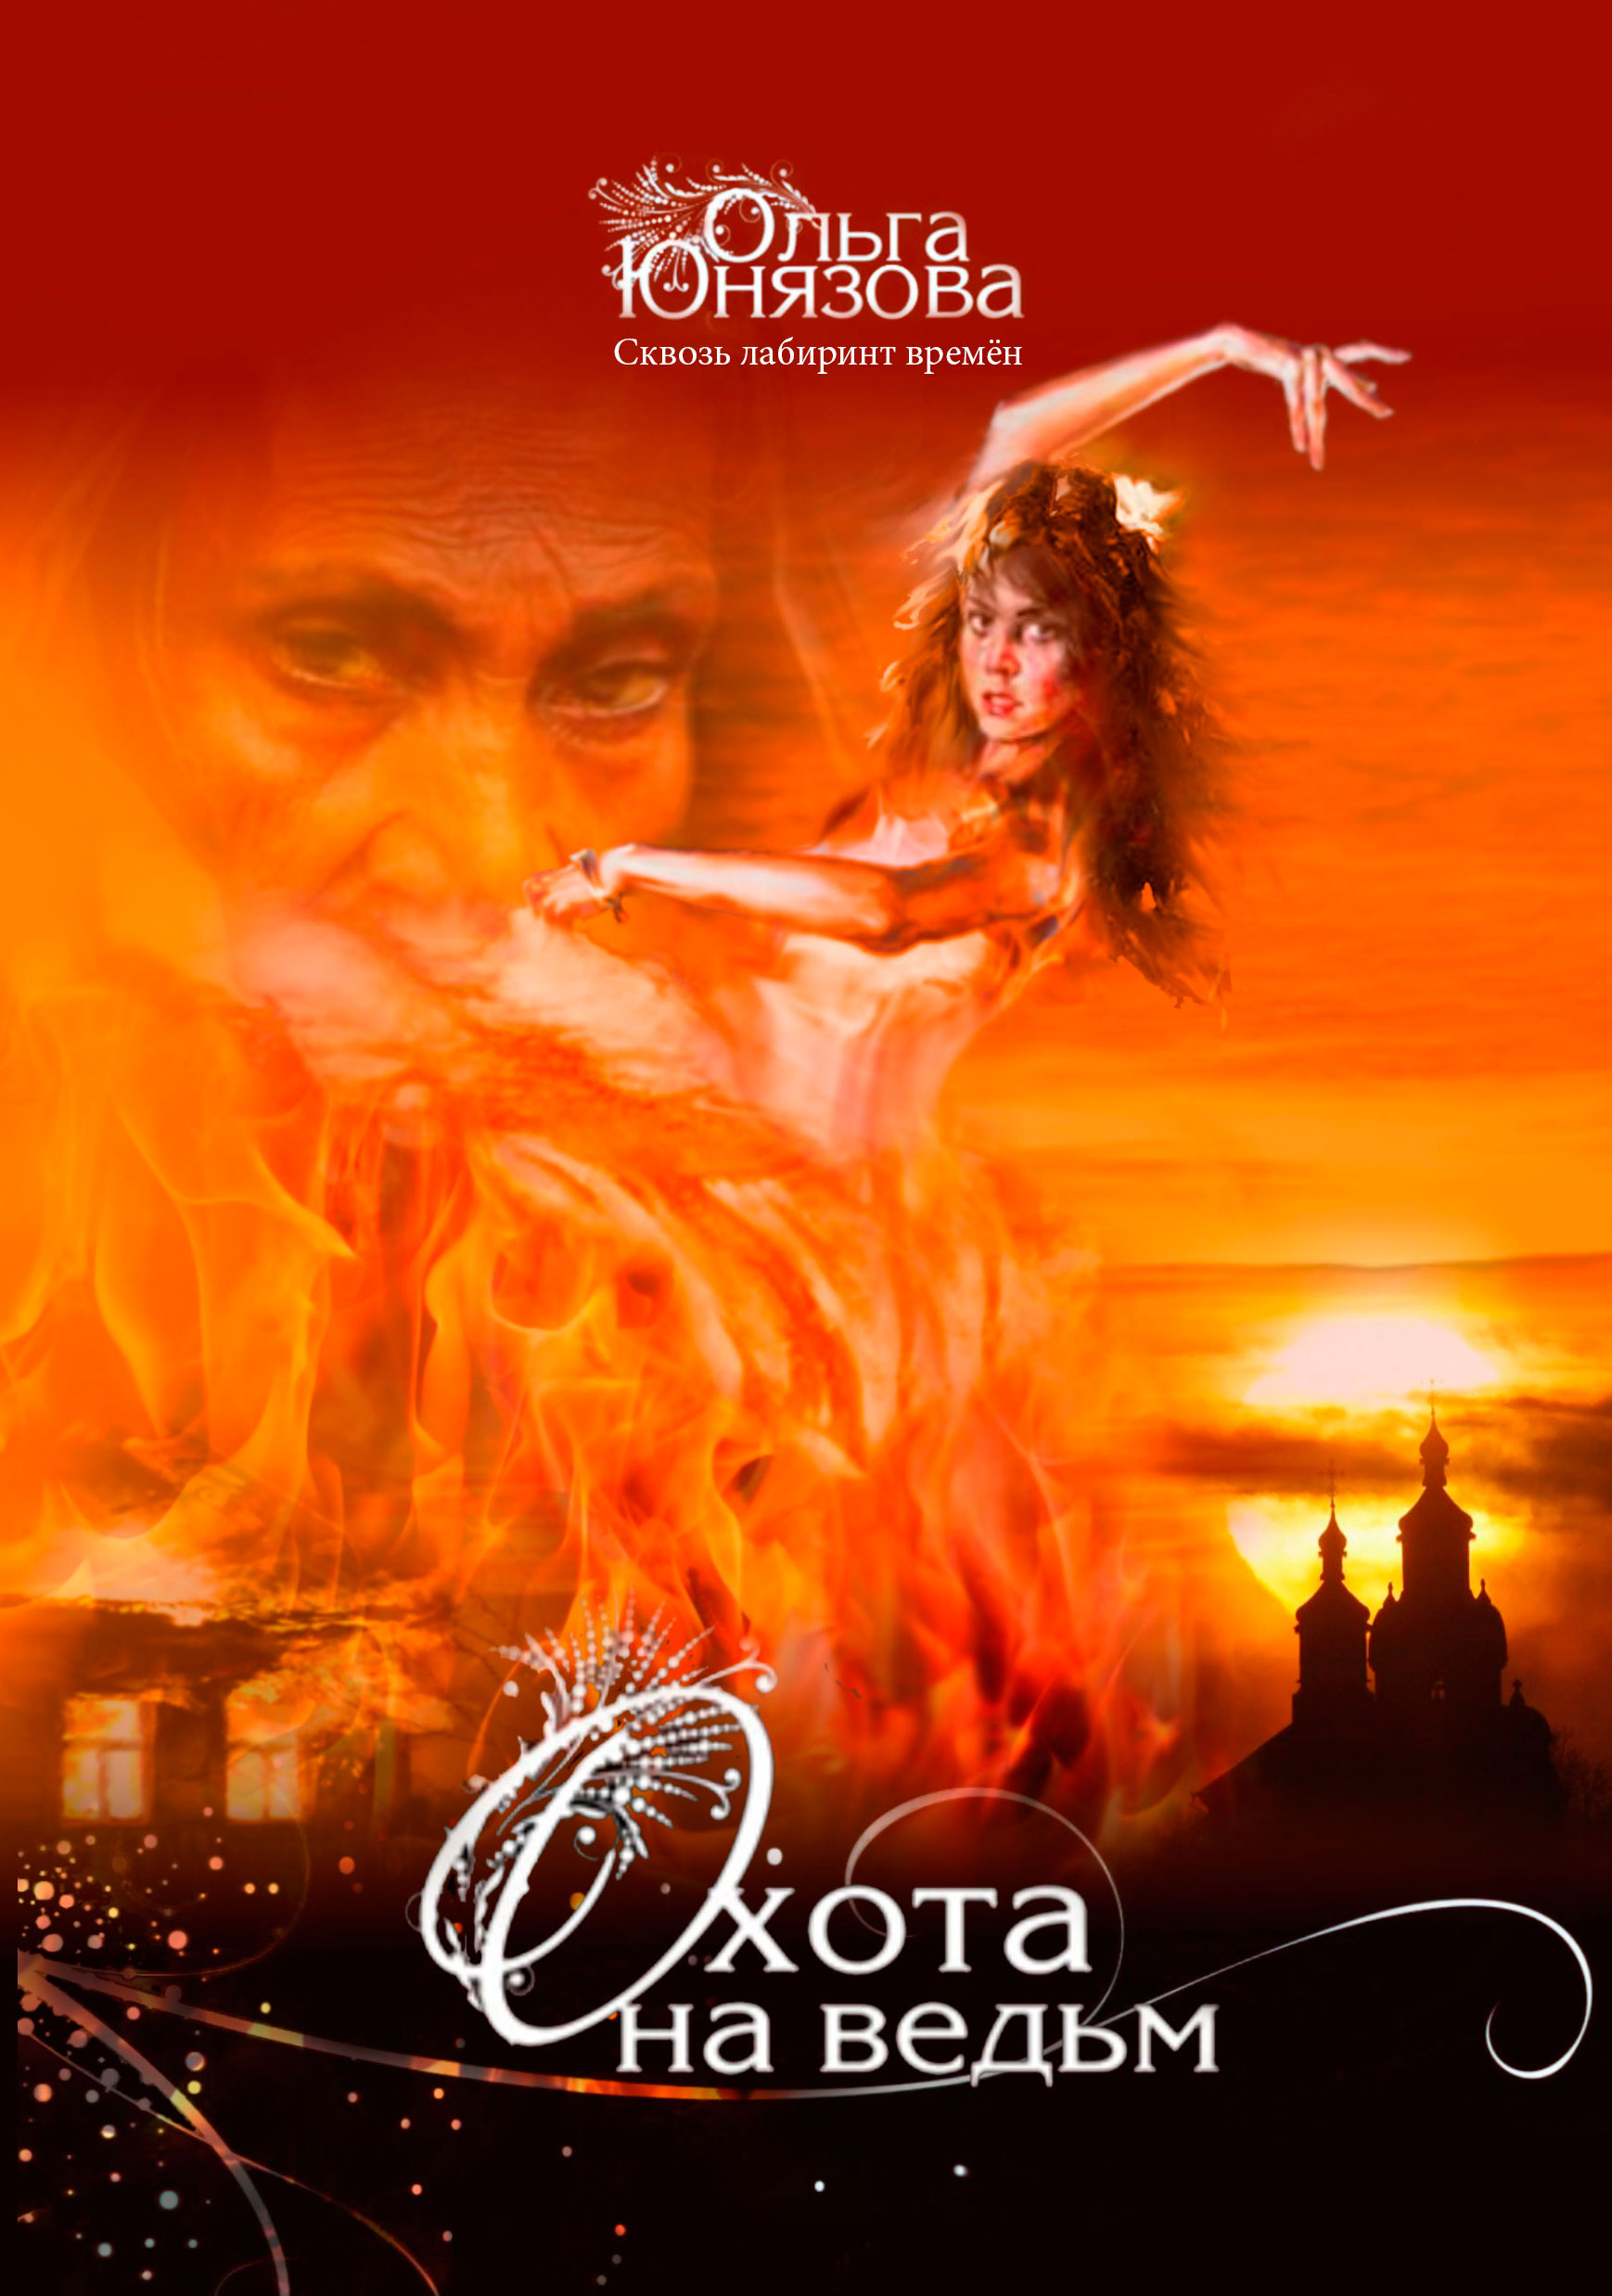 Ольга Юнязова Охота на ведьм цена